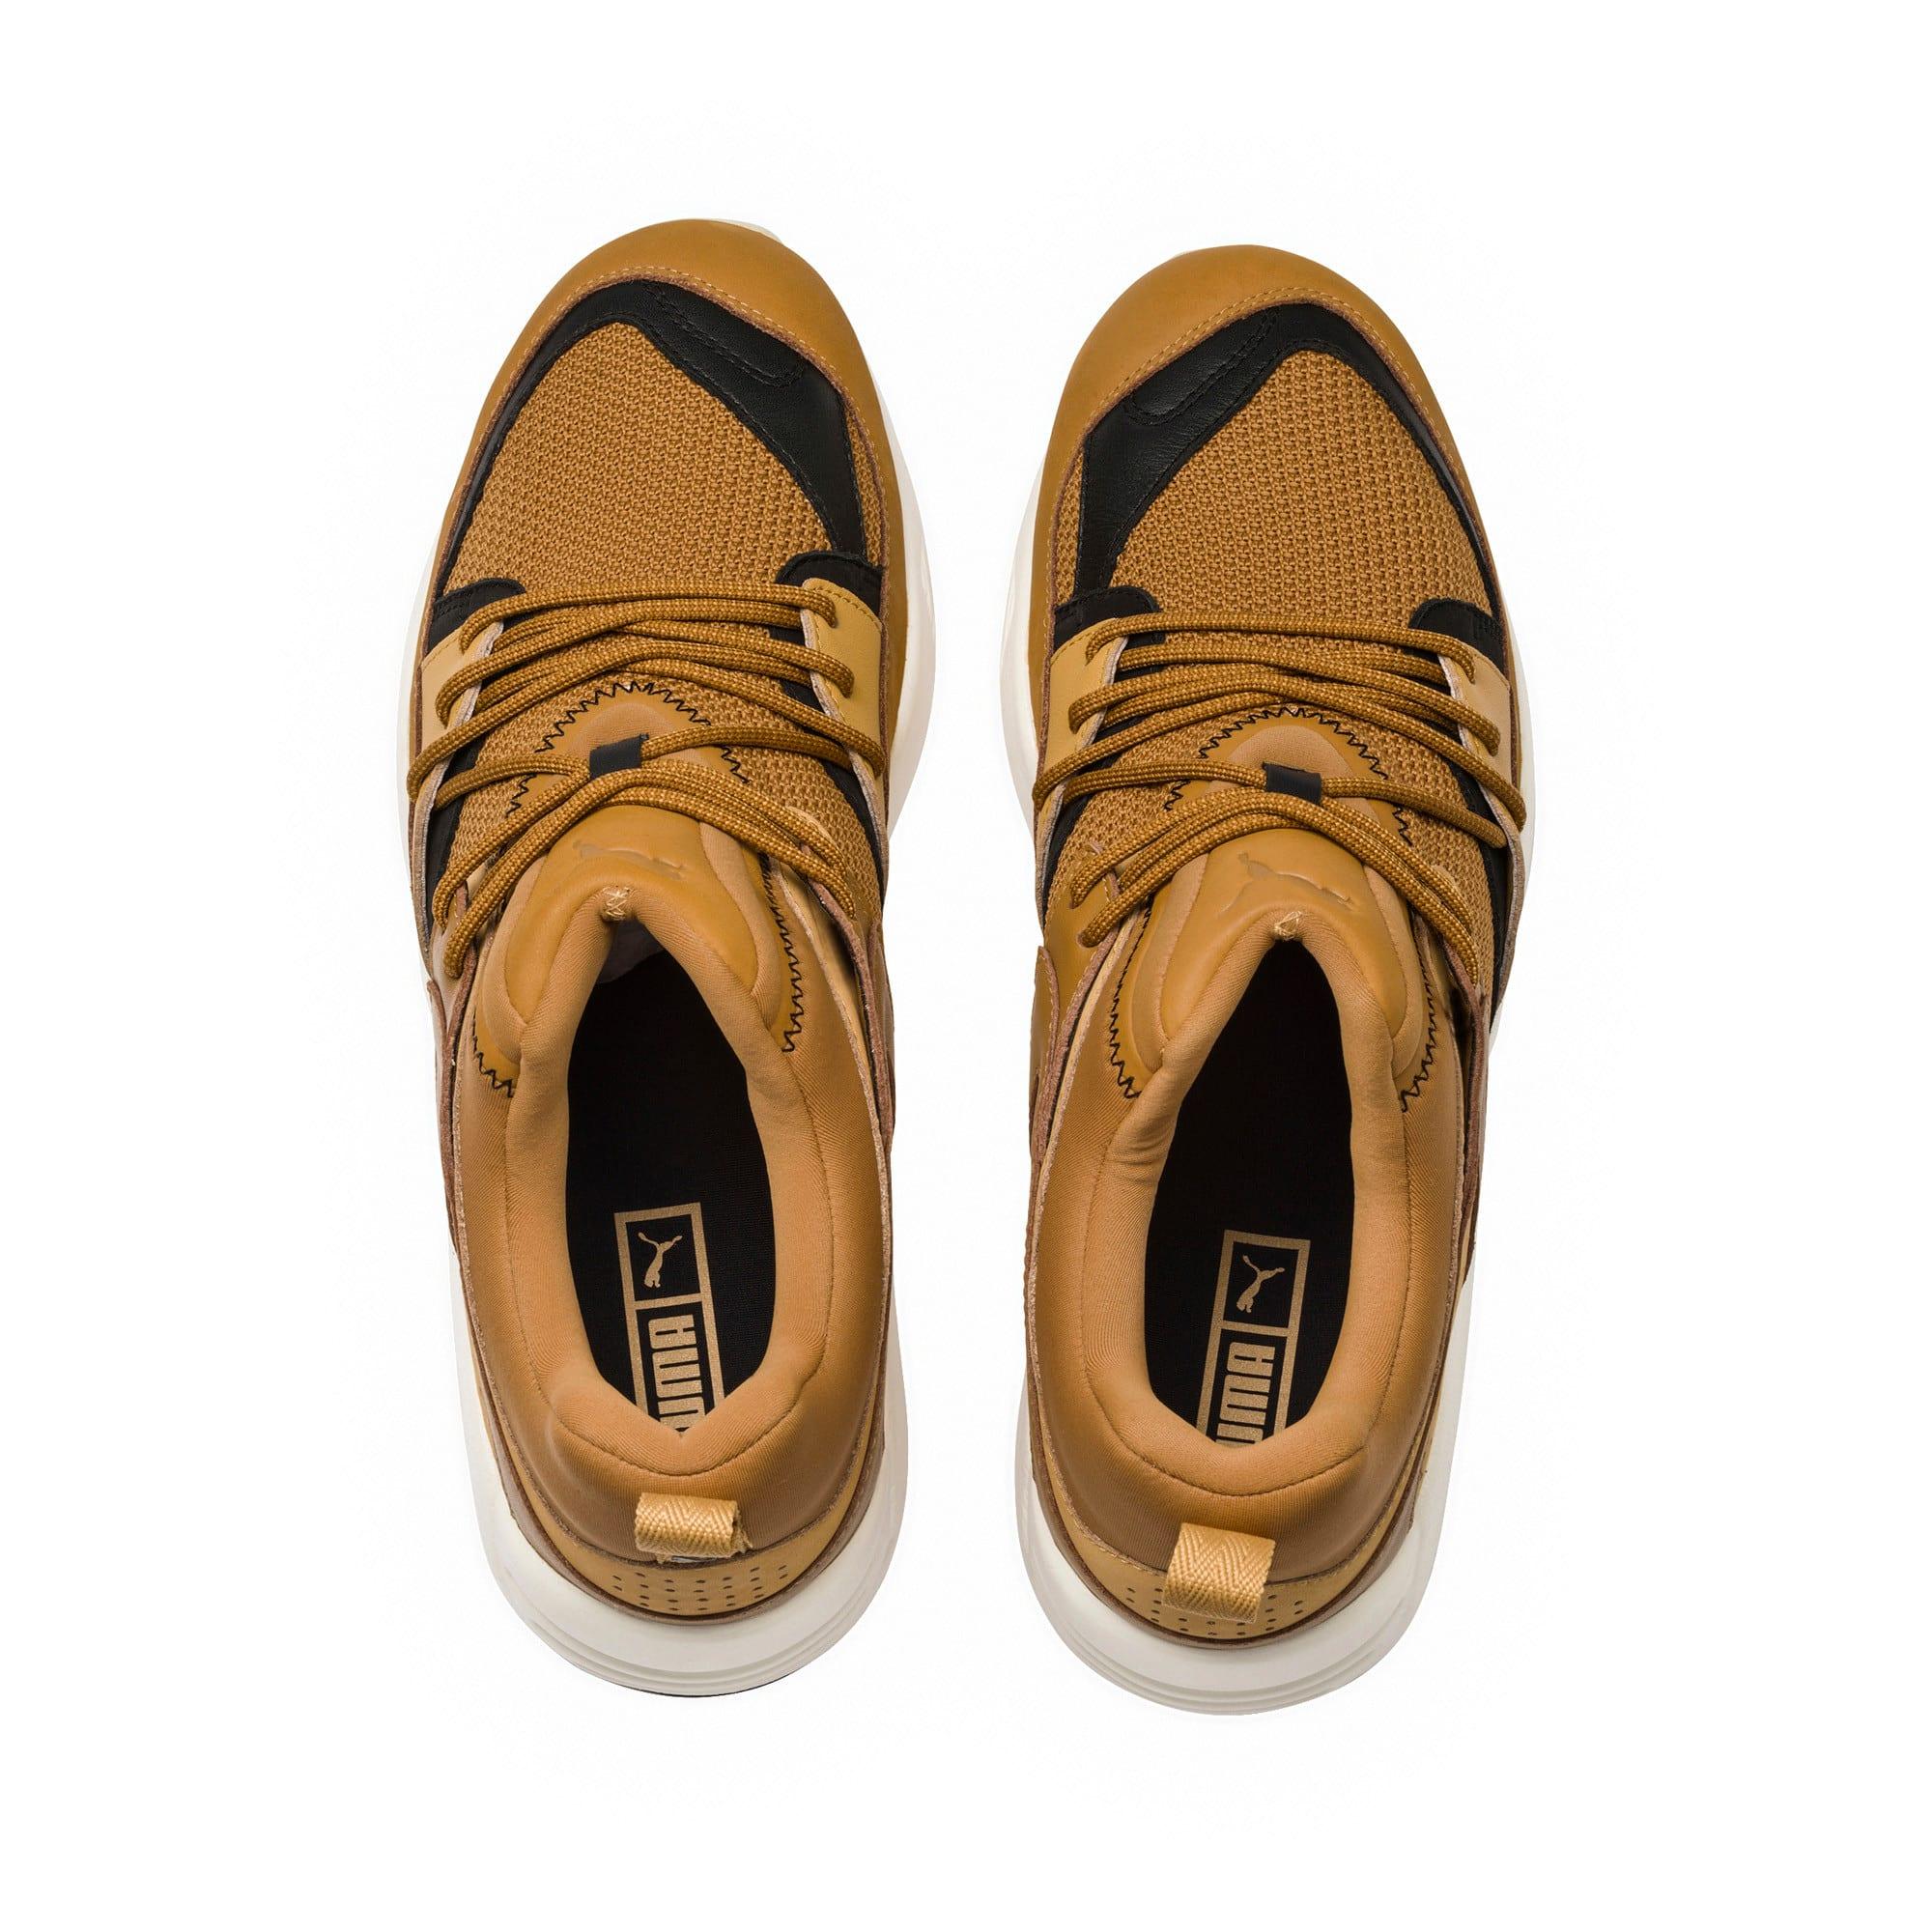 Thumbnail 5 of Blaze of Glory Sunfade Trainers, Golden Brown-Honey Mustard, medium-IND